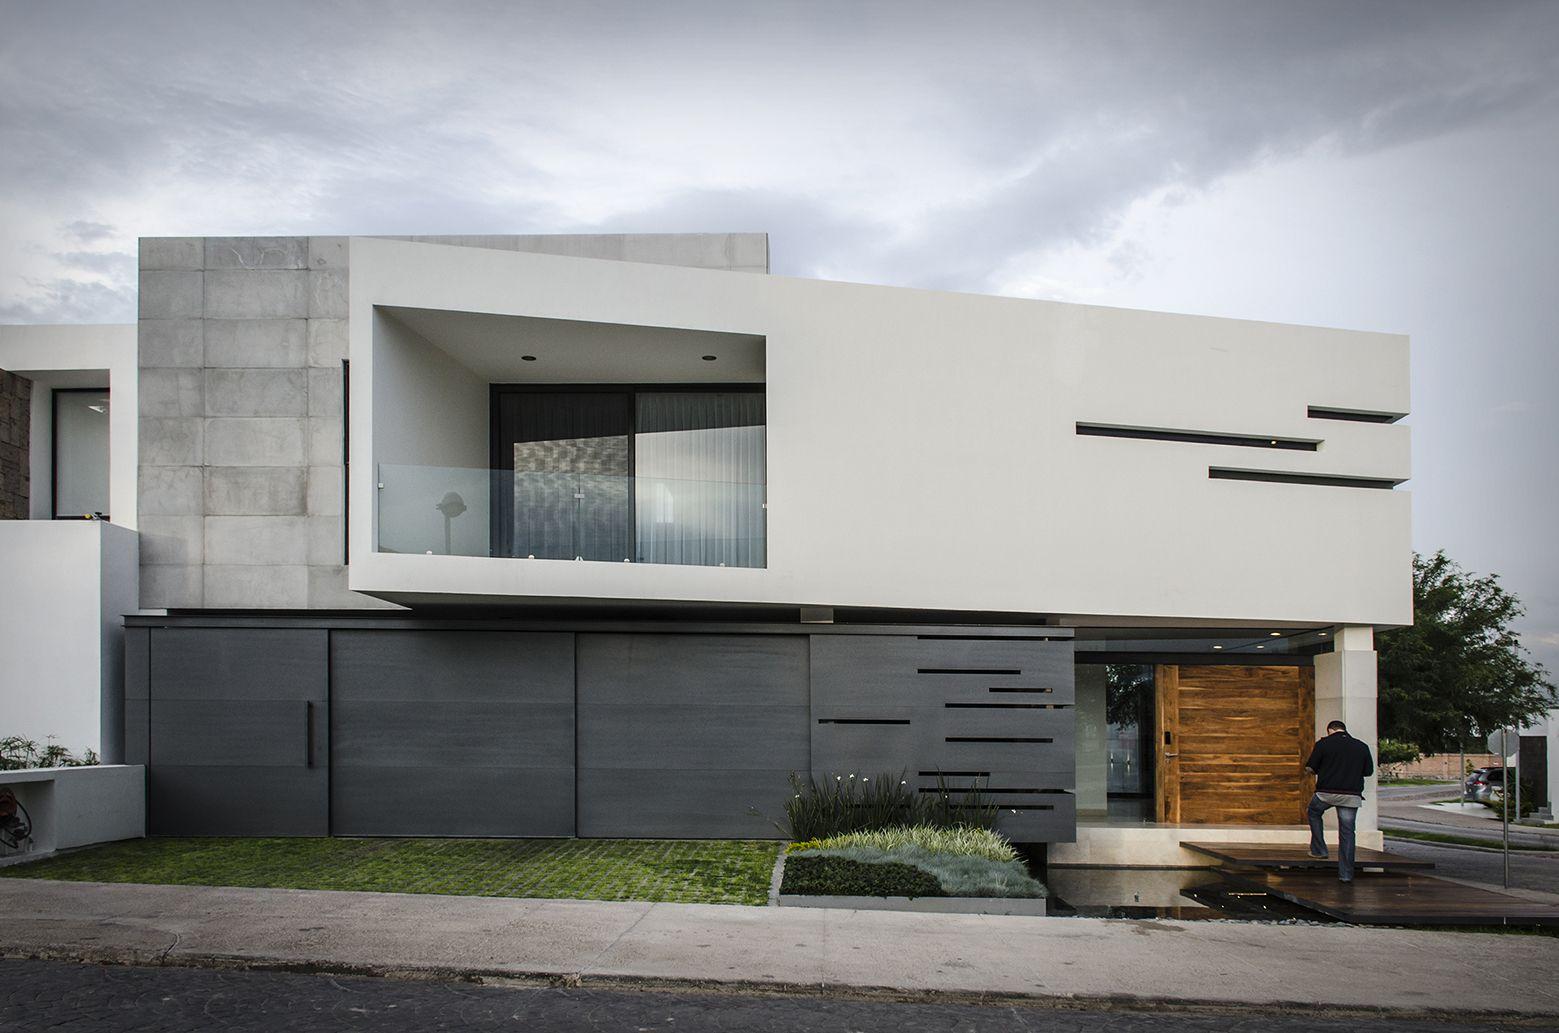 Casa María / Arkylab | Ville moderne, Façades et Maison moderne